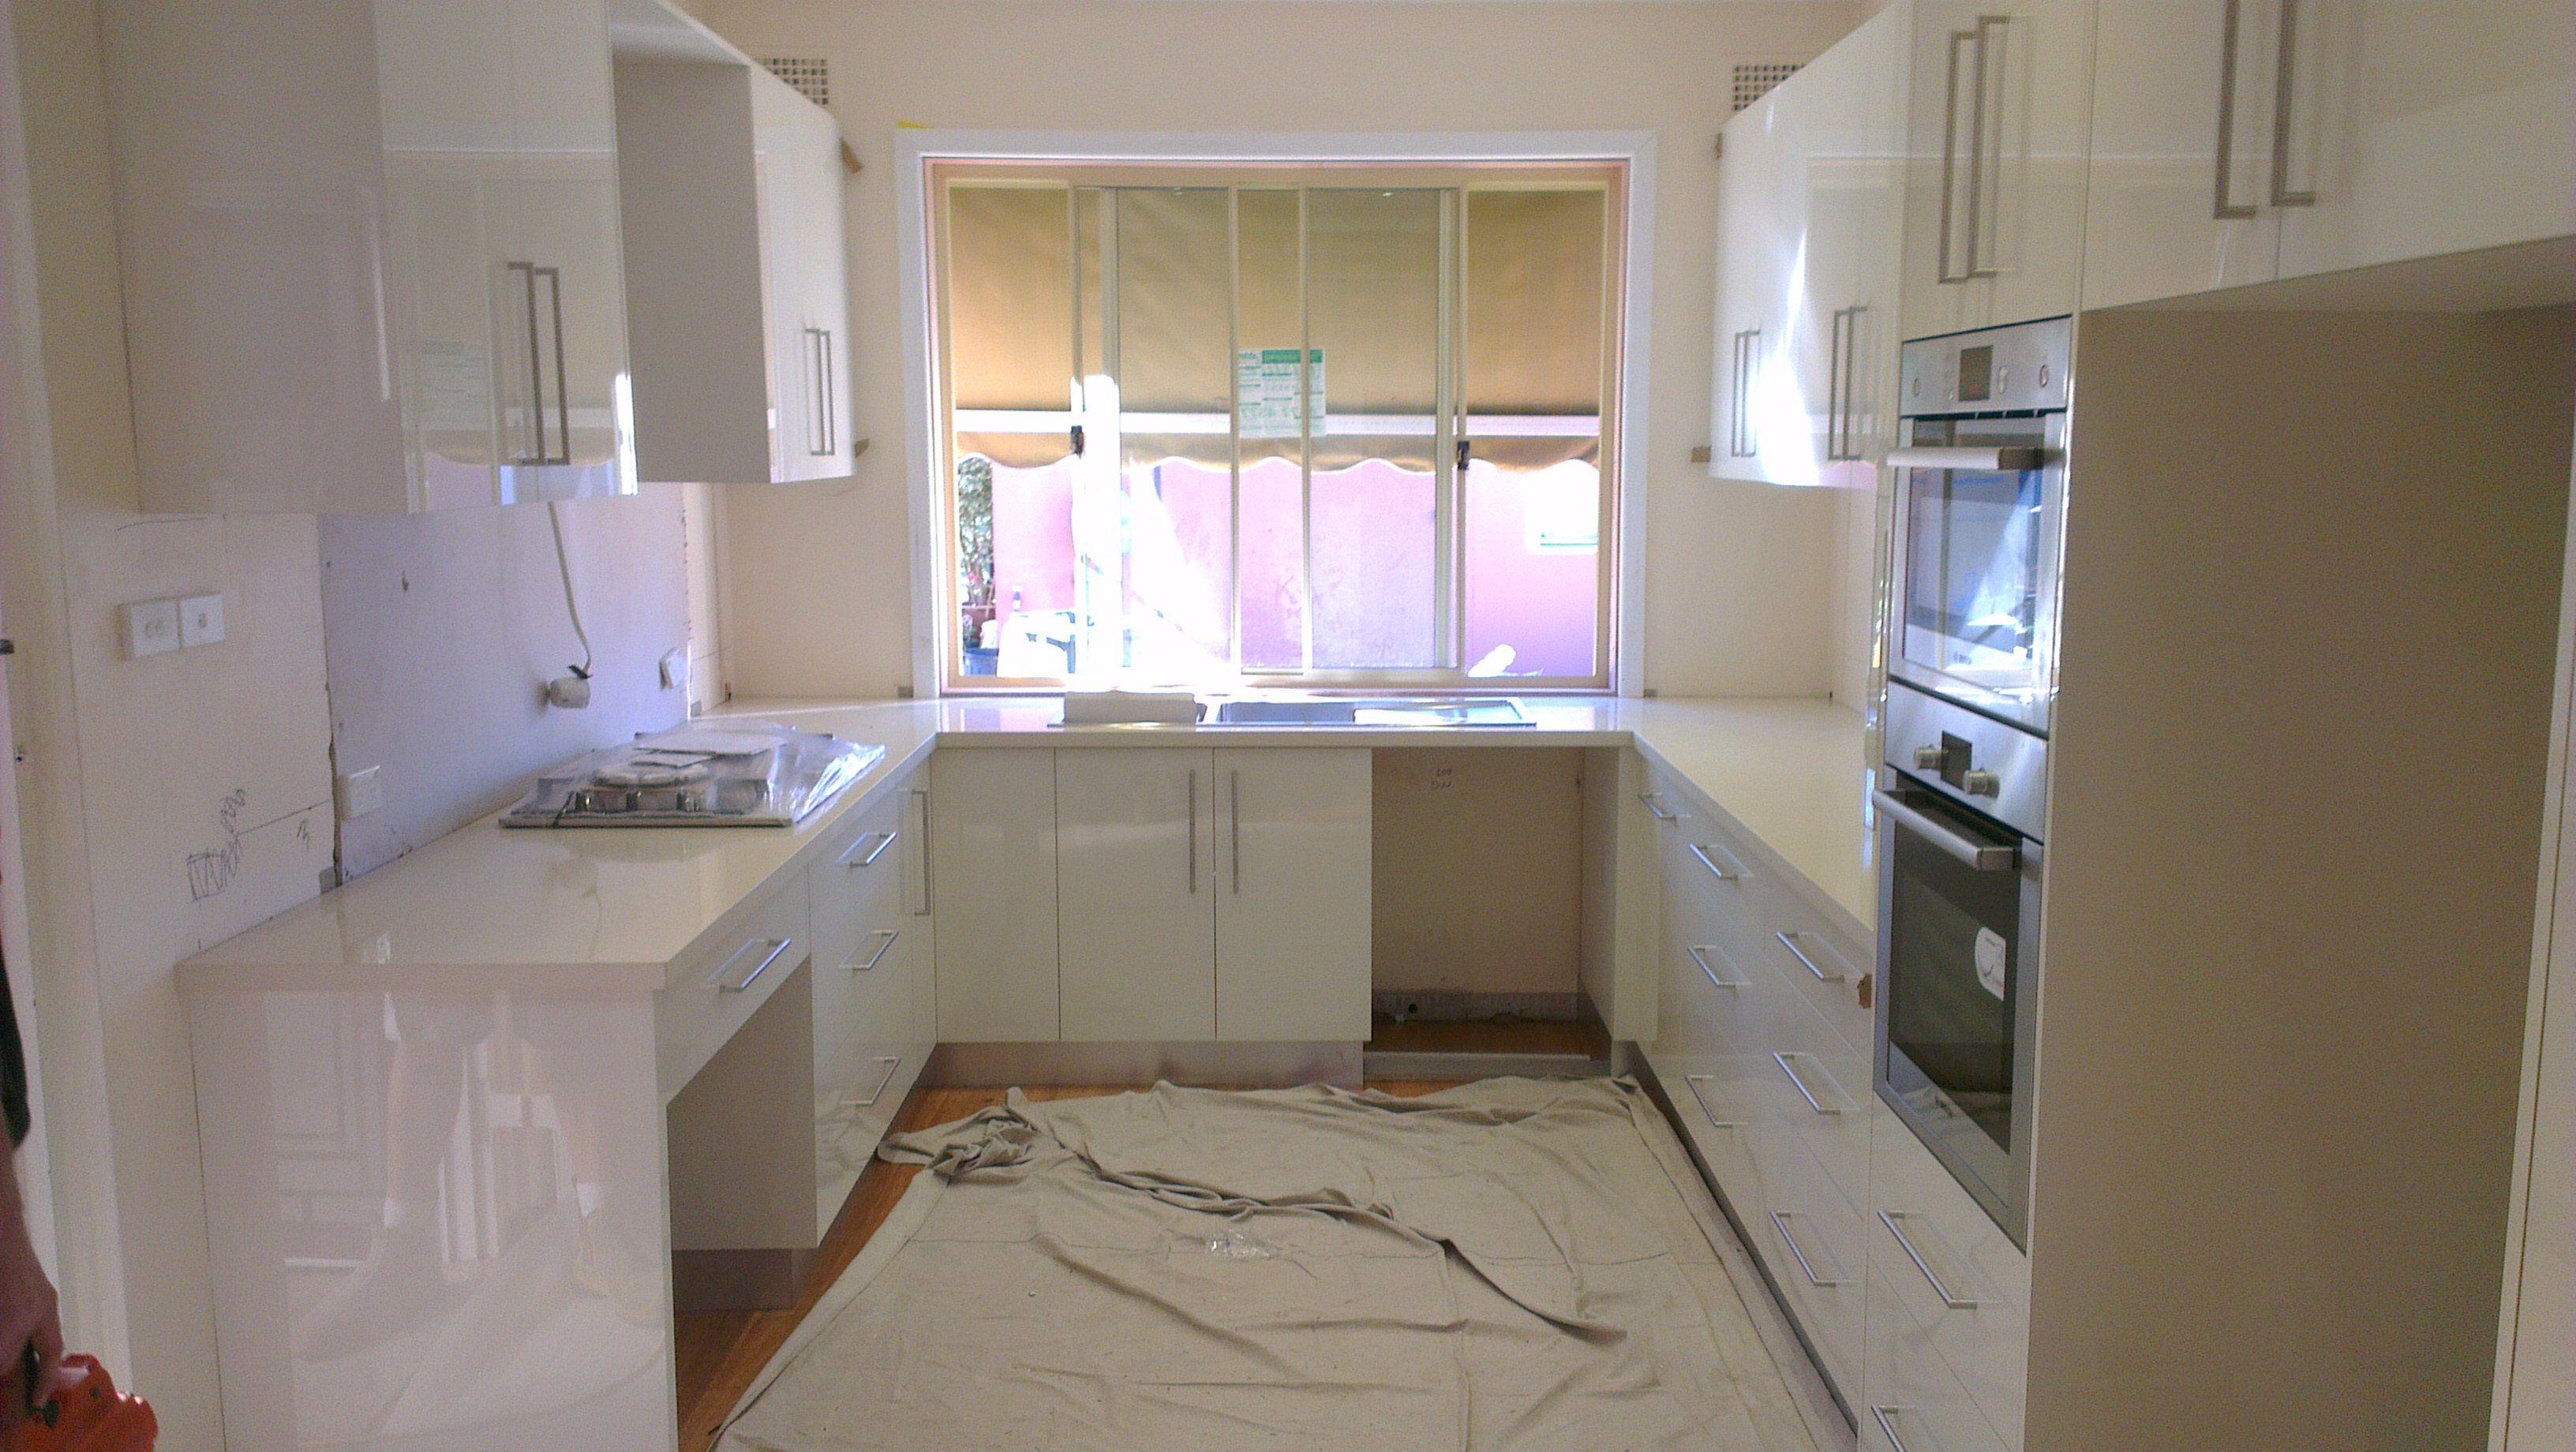 9 X 9 Kitchen Design   Kitchen design, Kitchen layout, Kitchen ...